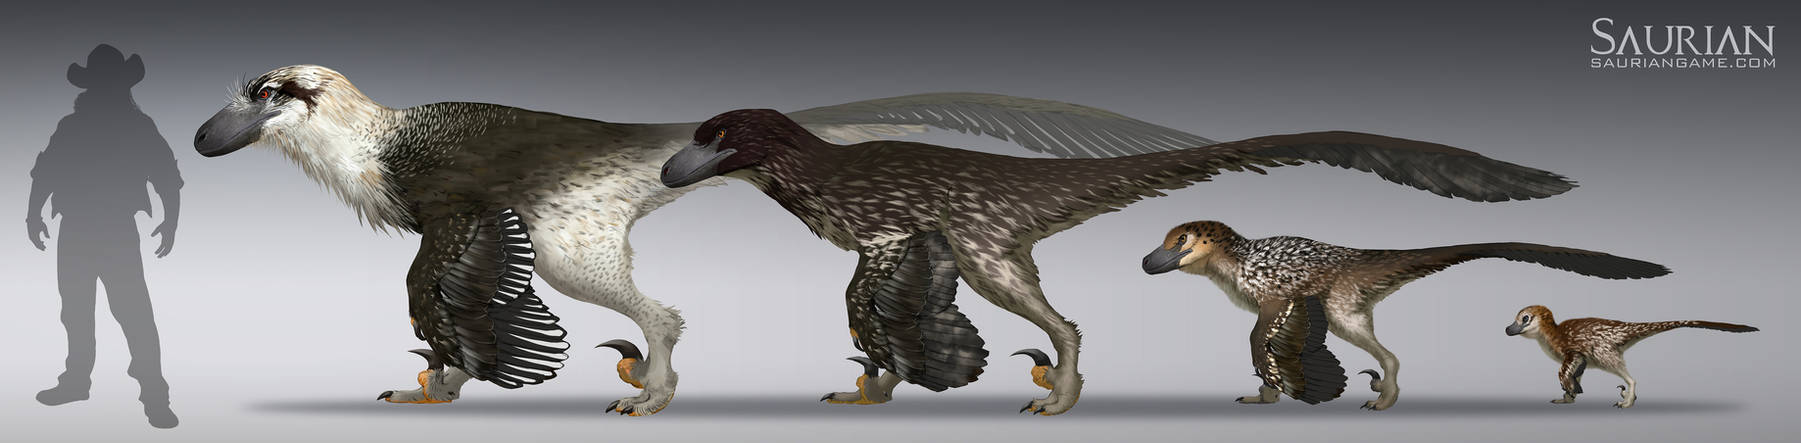 Dakotaraptor Growth Cycle